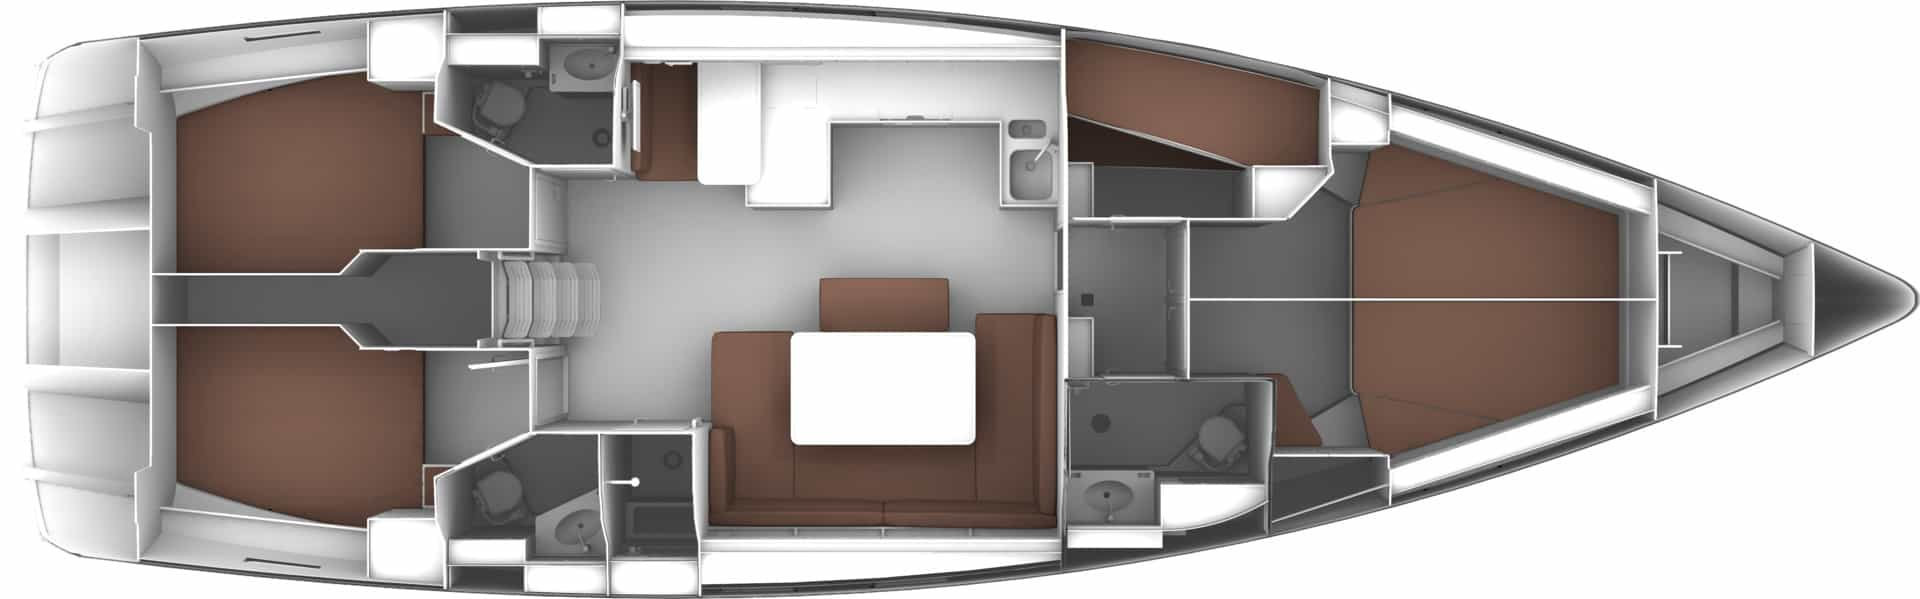 Bavaria Cruiser 51 layout